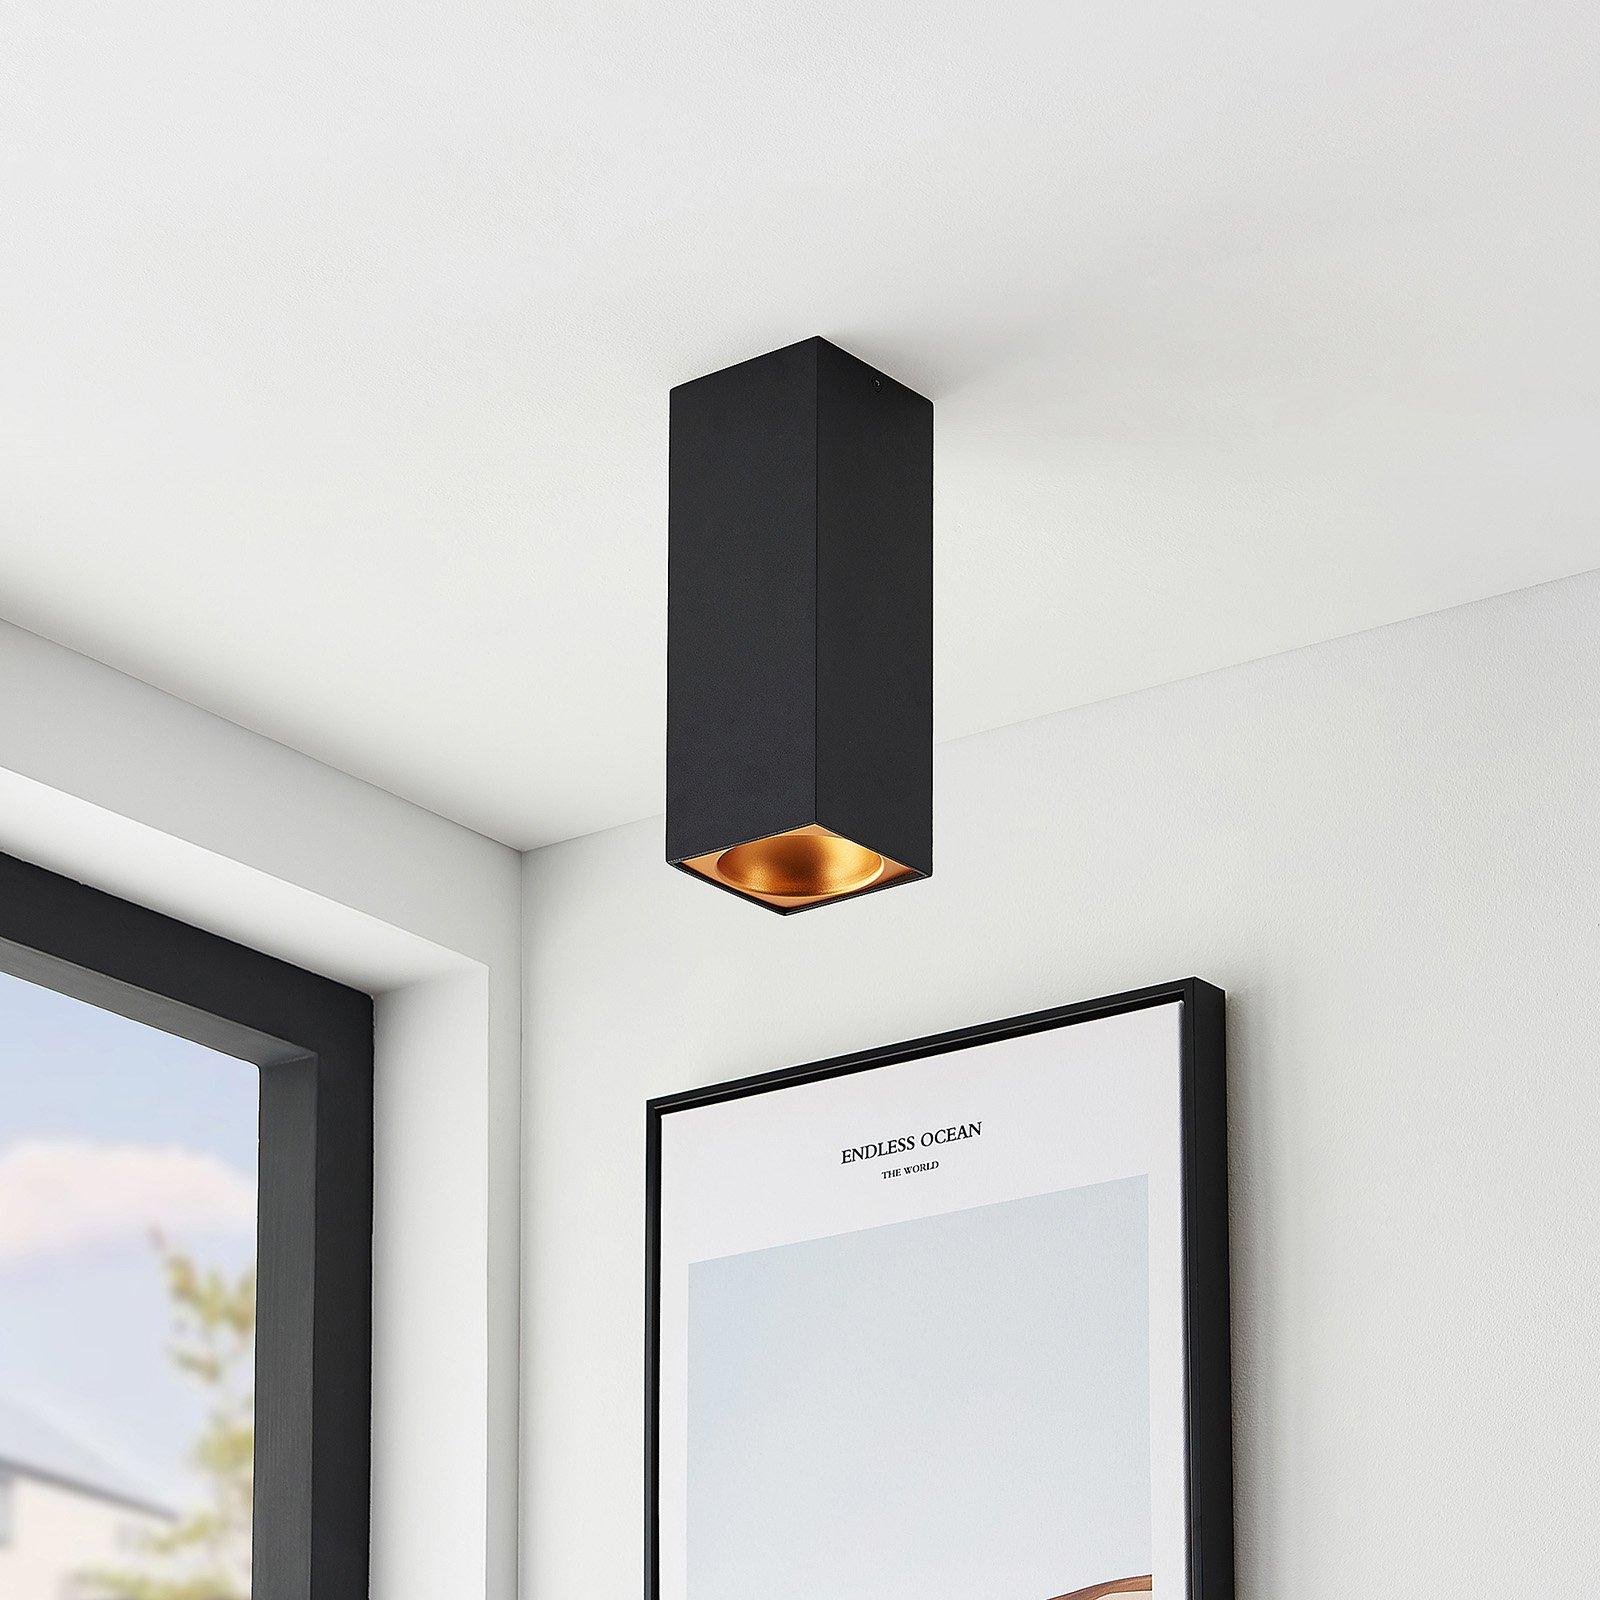 Arcchio Hinka taklampe, kantet 25,4 cm svart